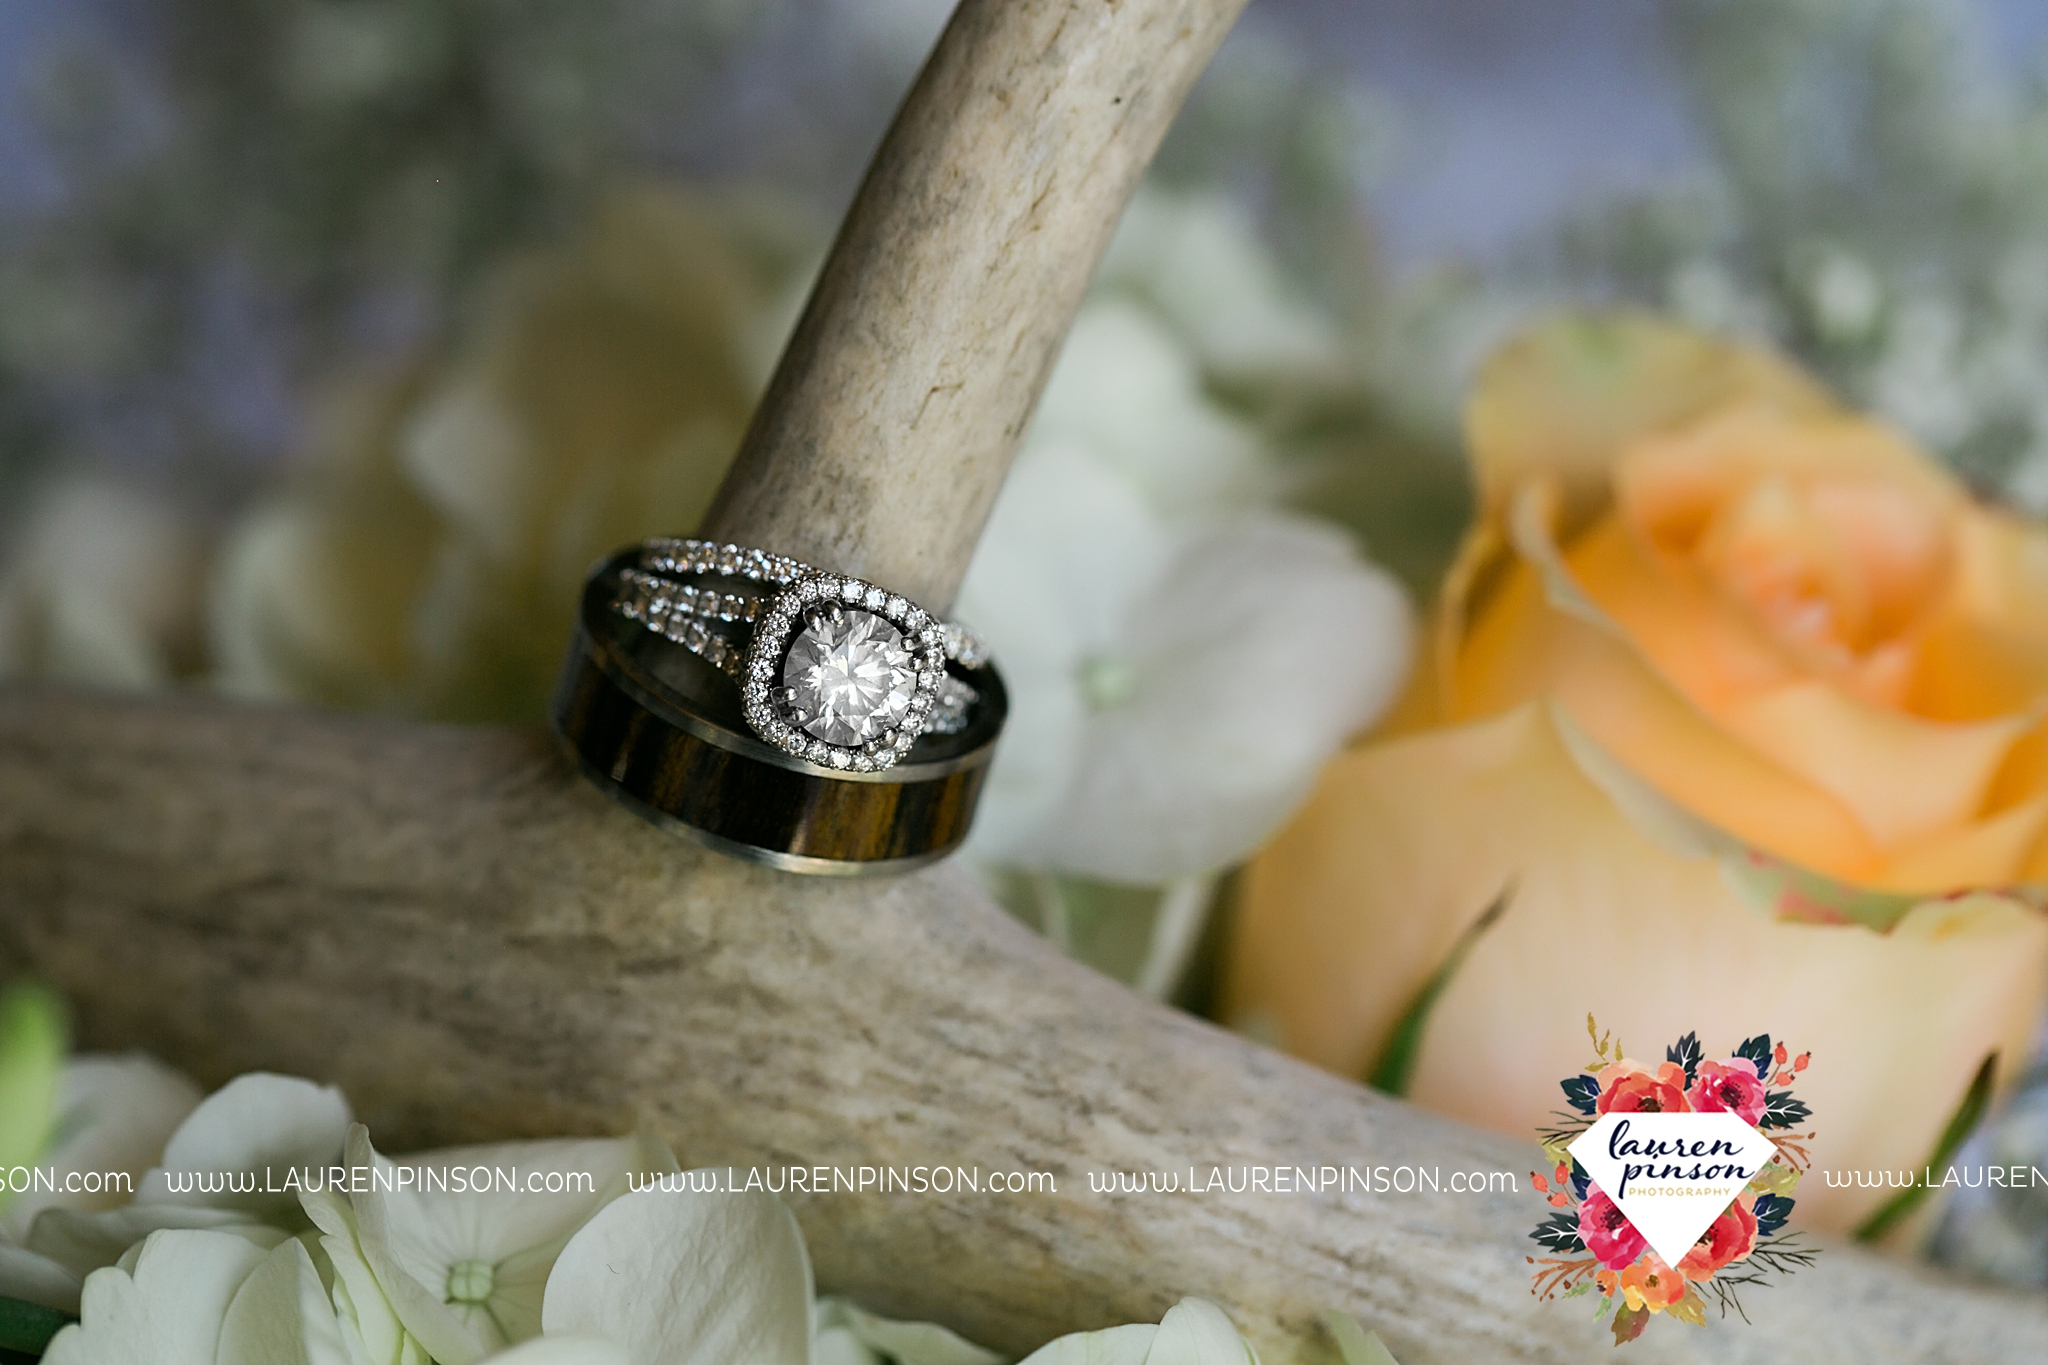 jones-barn-willow-creek-ranch-wedding-in-cleburne-texas-fort-worth-dfw-wichita-falls-wedding-photography_3186.jpg